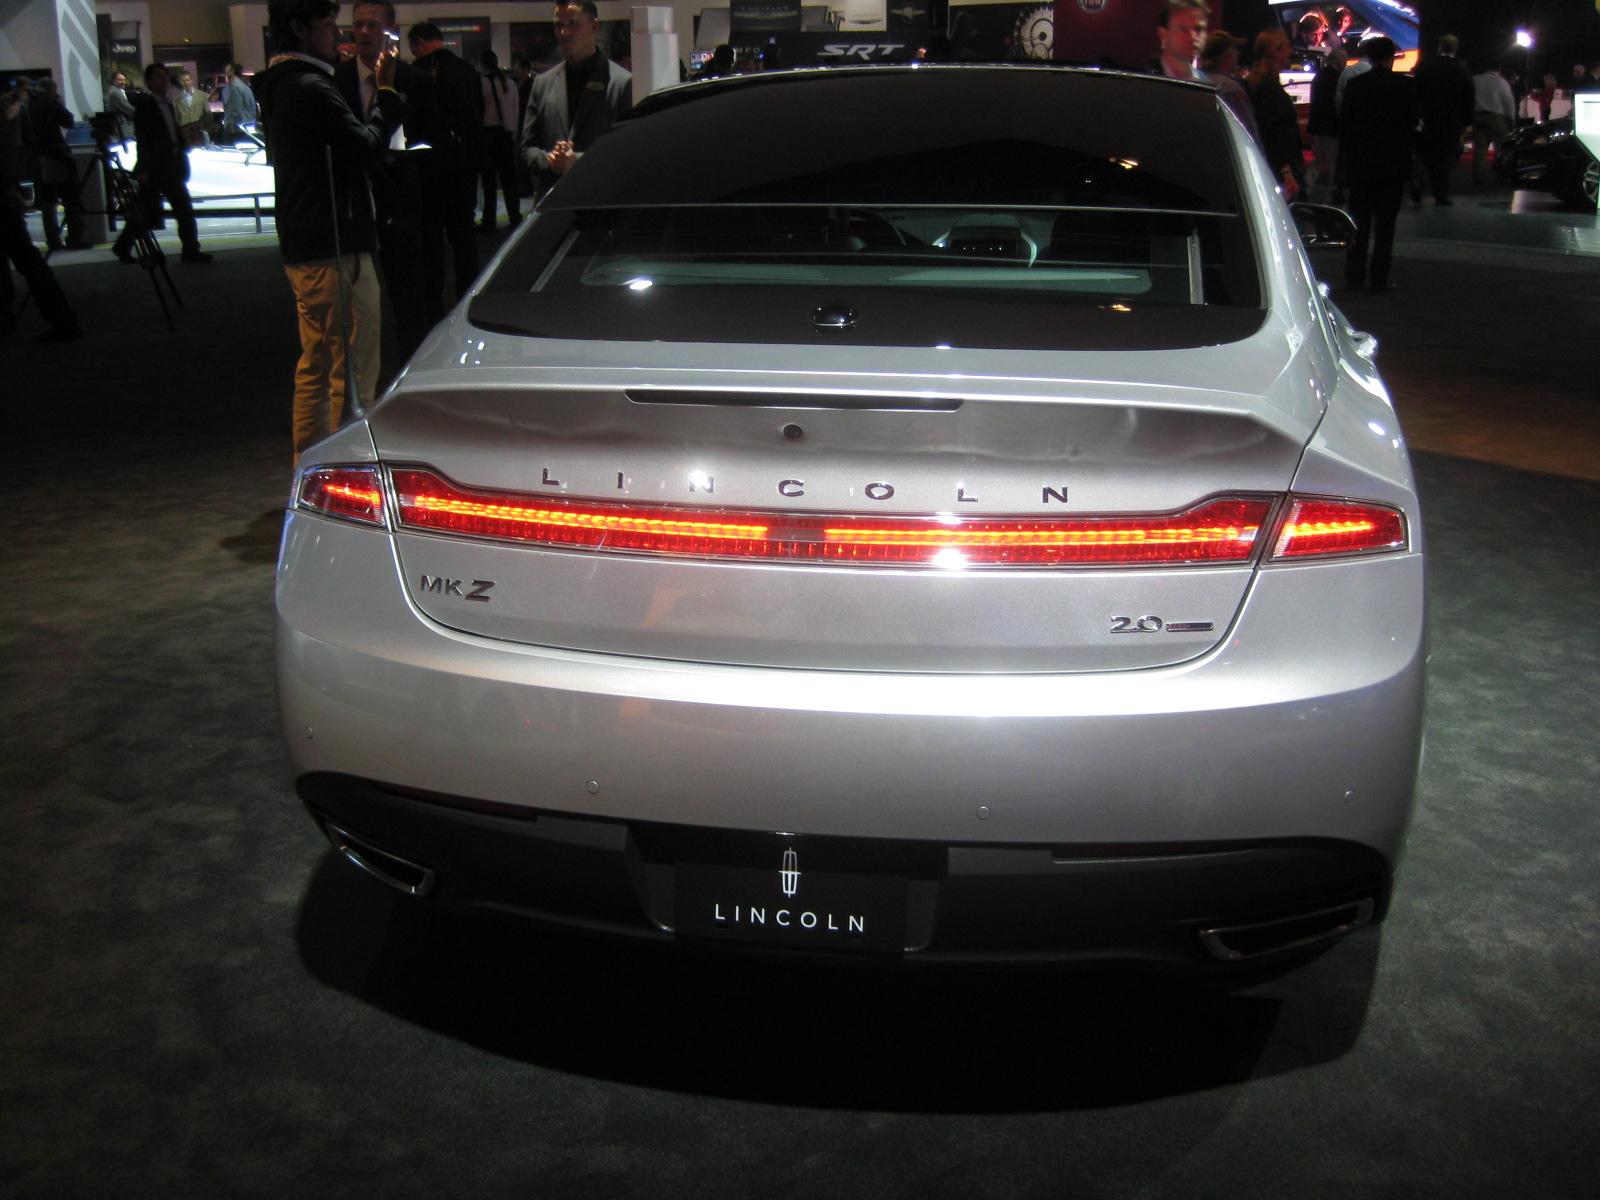 Lincoln 2013 Mkz Rear Todd Bianco S Acarisnotarefrigerator Com Blog